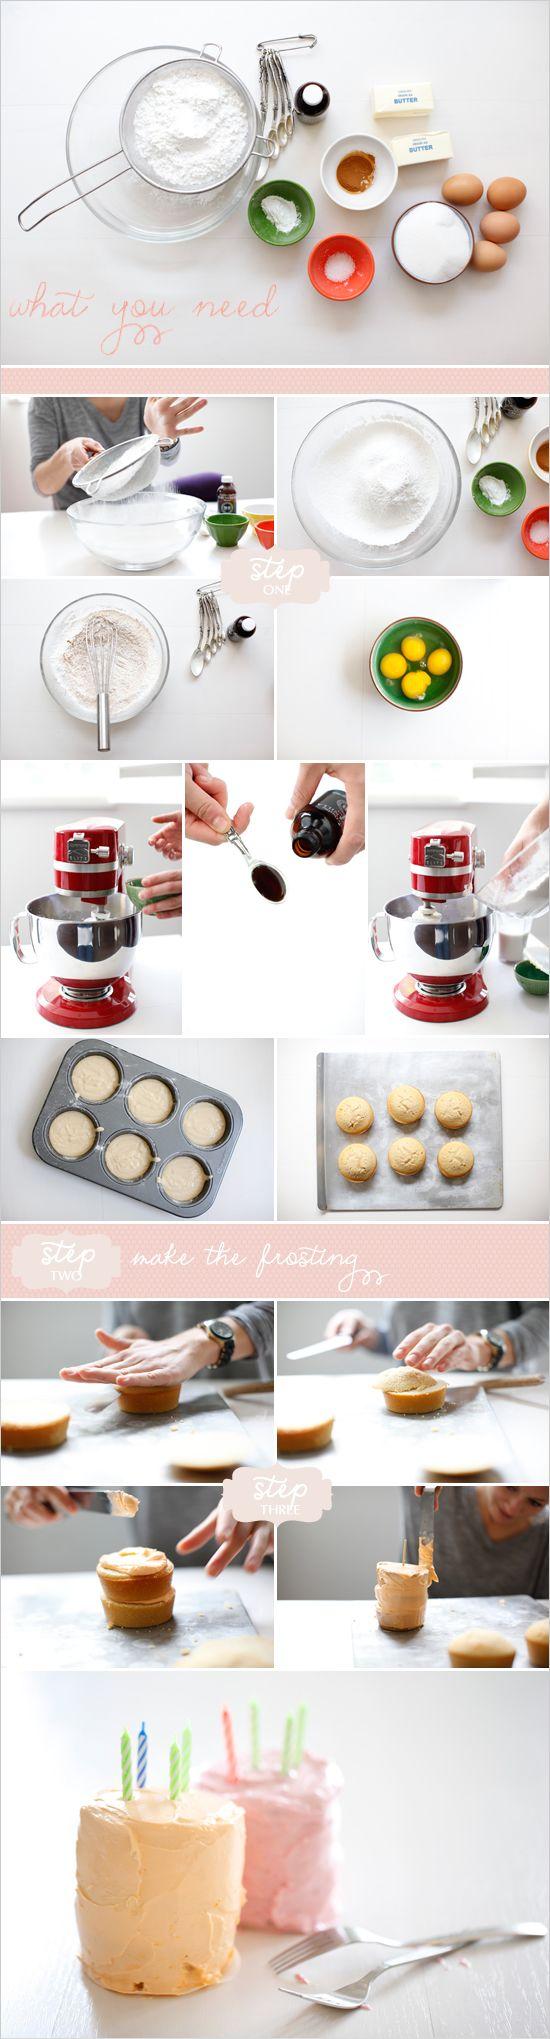 how to make mini cakes using a muffin pan. #dessert #recipes http://www.weddingchicks.com/2012/03/19/how-to-make-mini-cakes/